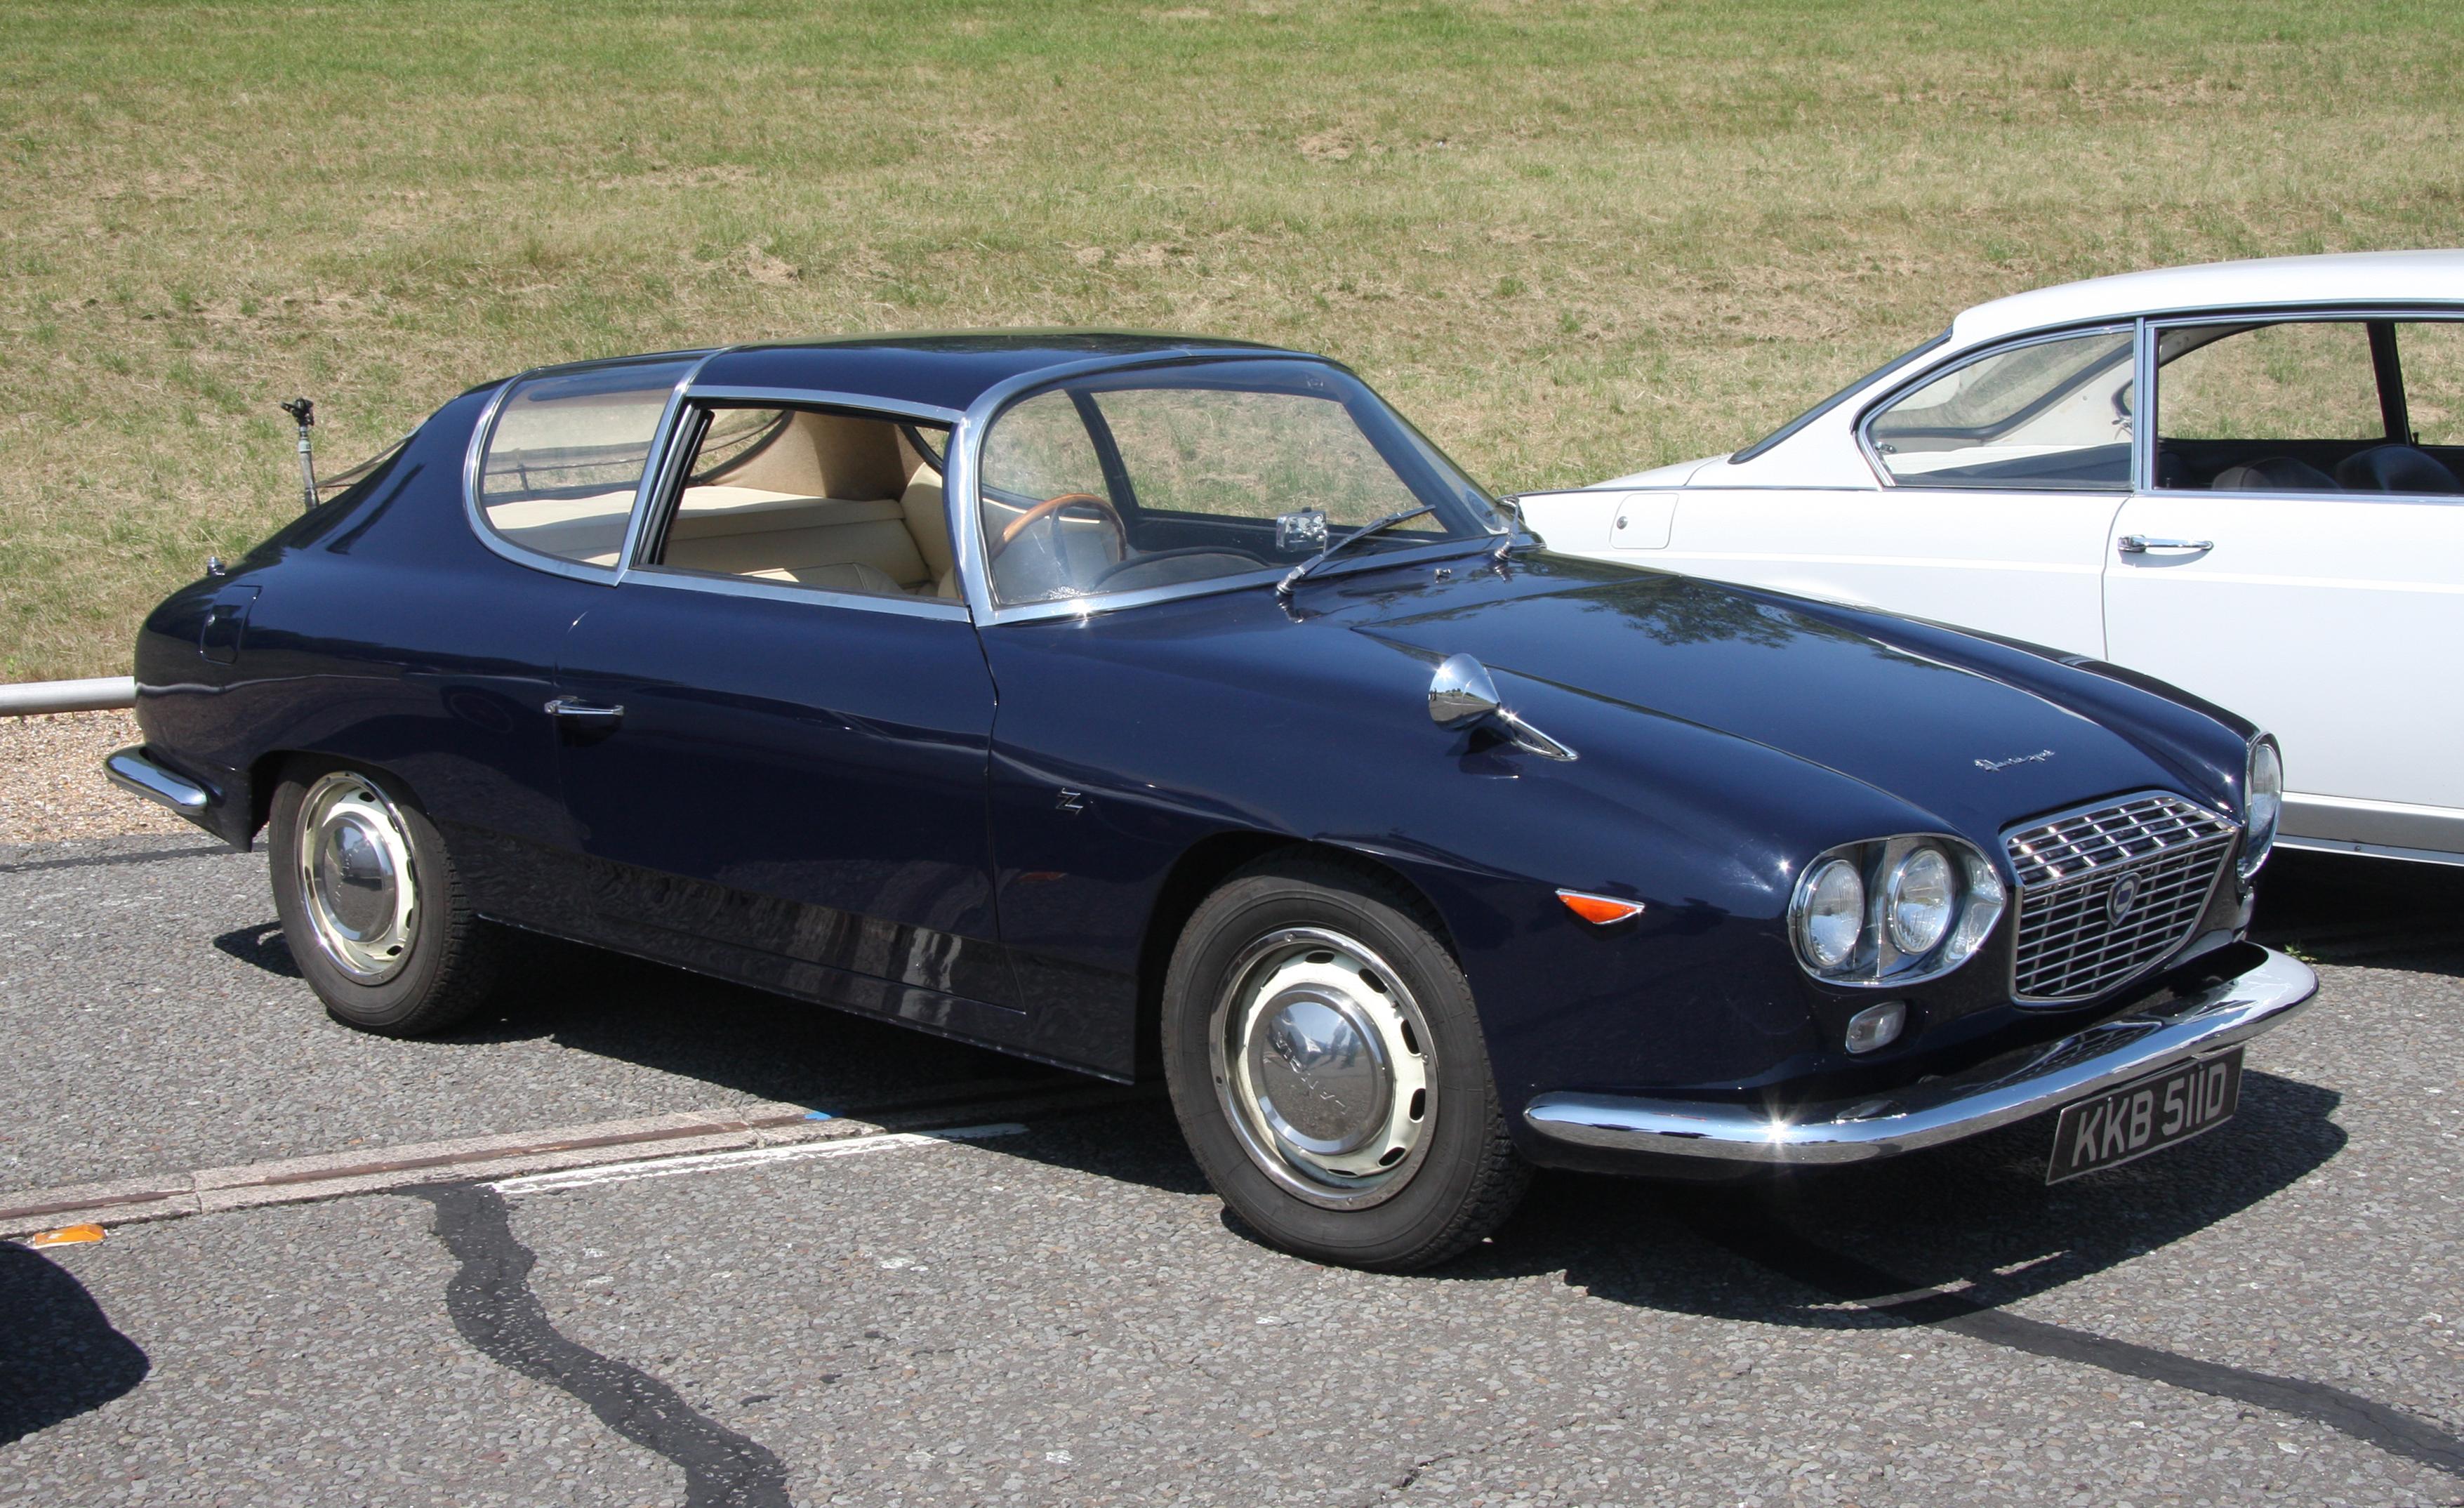 https://upload.wikimedia.org/wikipedia/commons/8/81/Lancia_Flavia_Sport_Zagato_-_Flickr_-_exfordy_%281%29.jpg